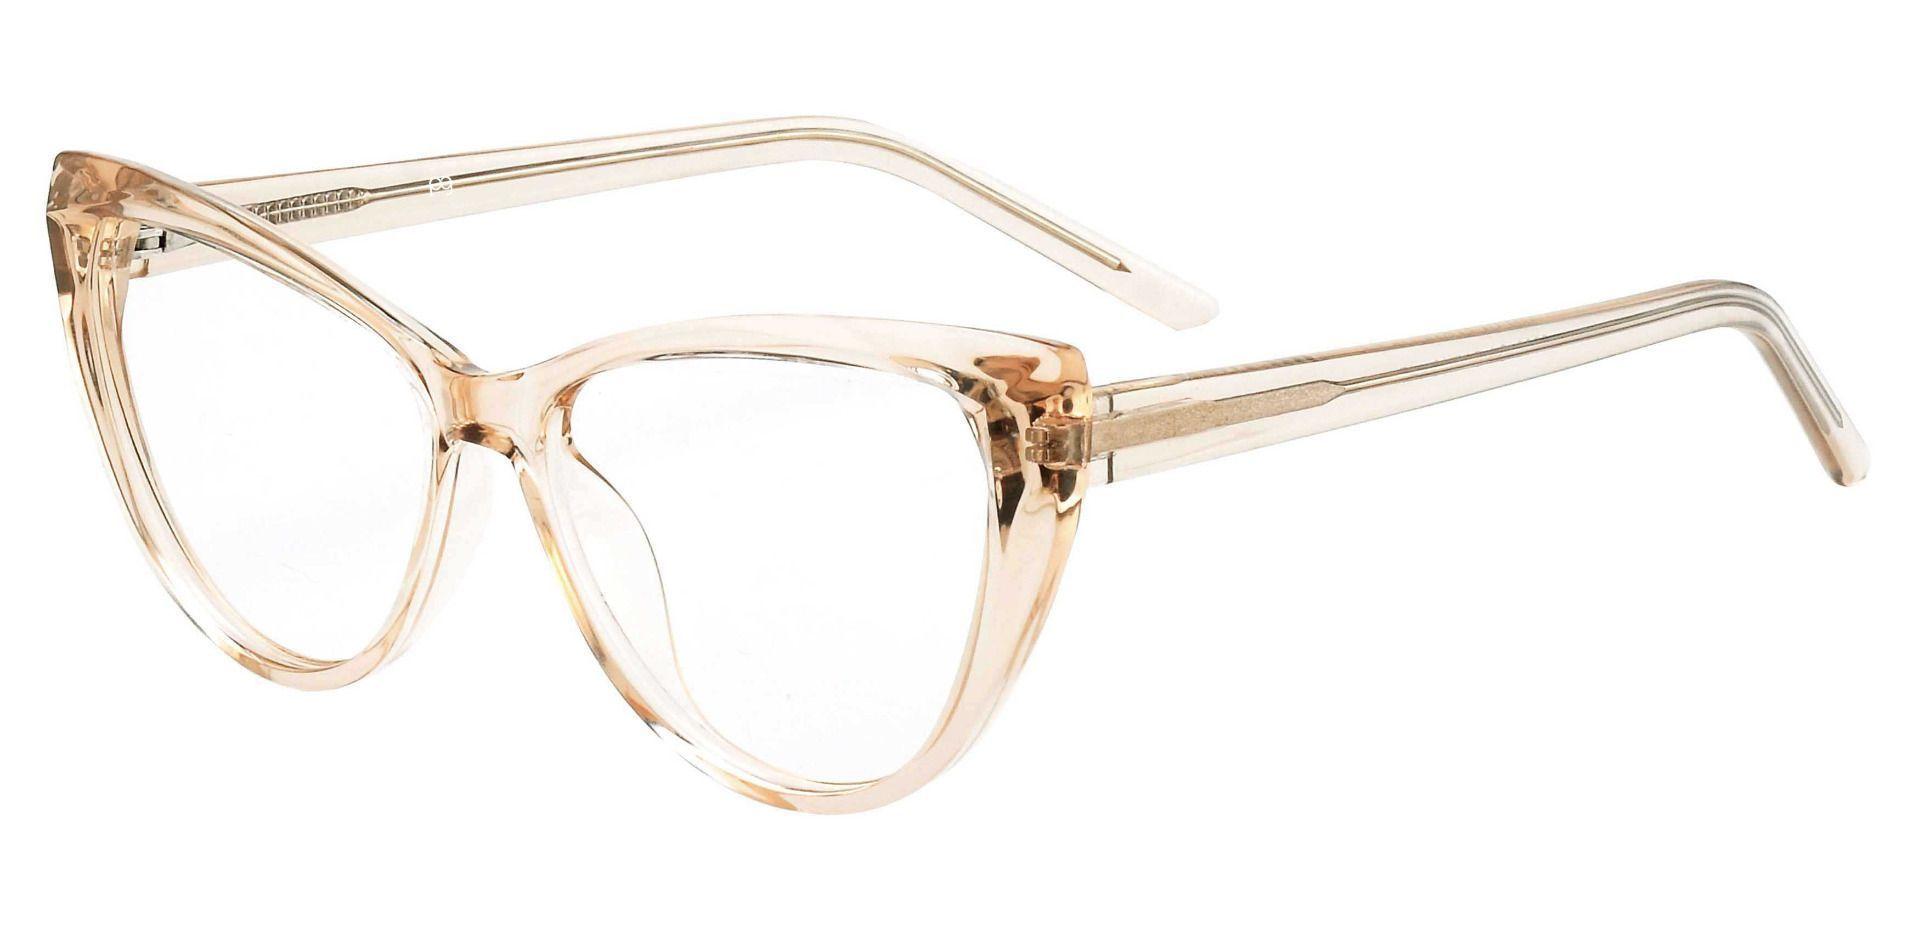 Ireland Cat Eye Prescription Glasses - Brown